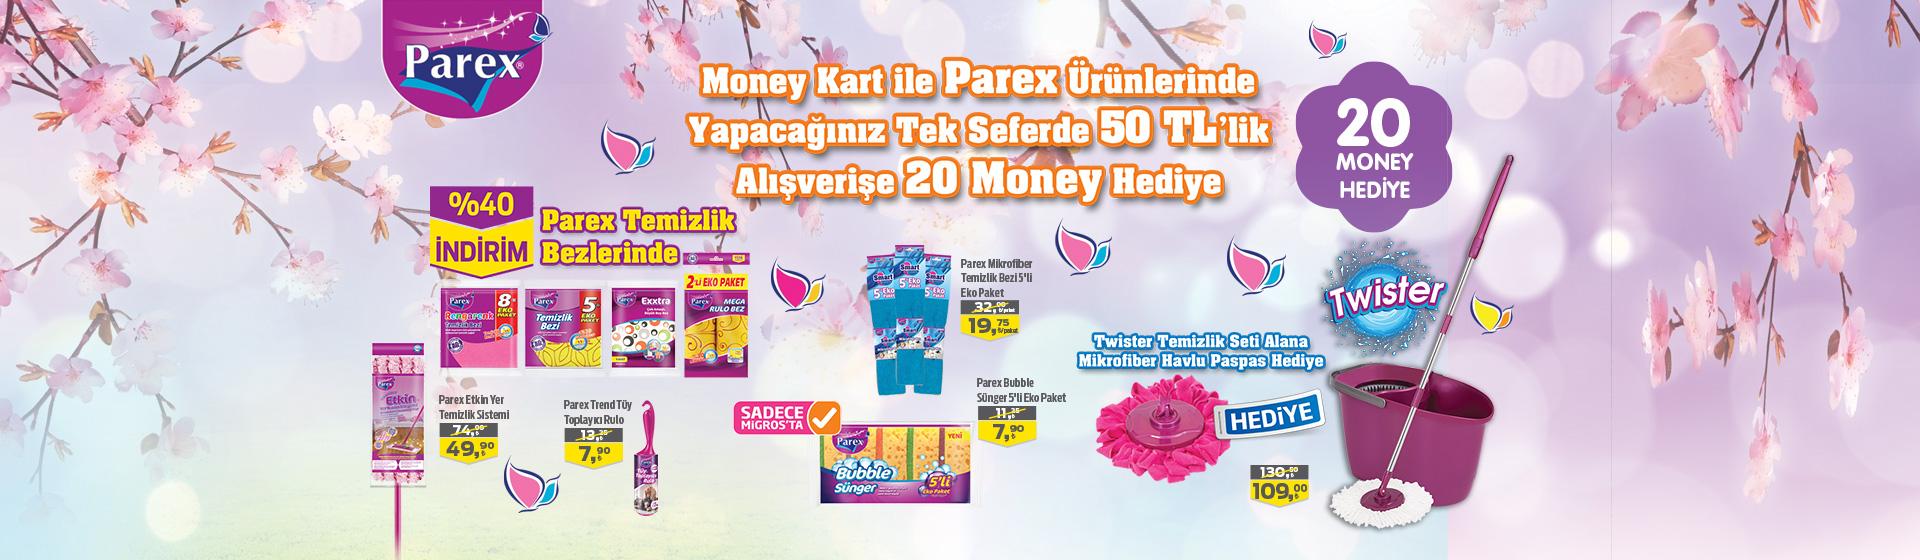 Parex Money Kampanyası